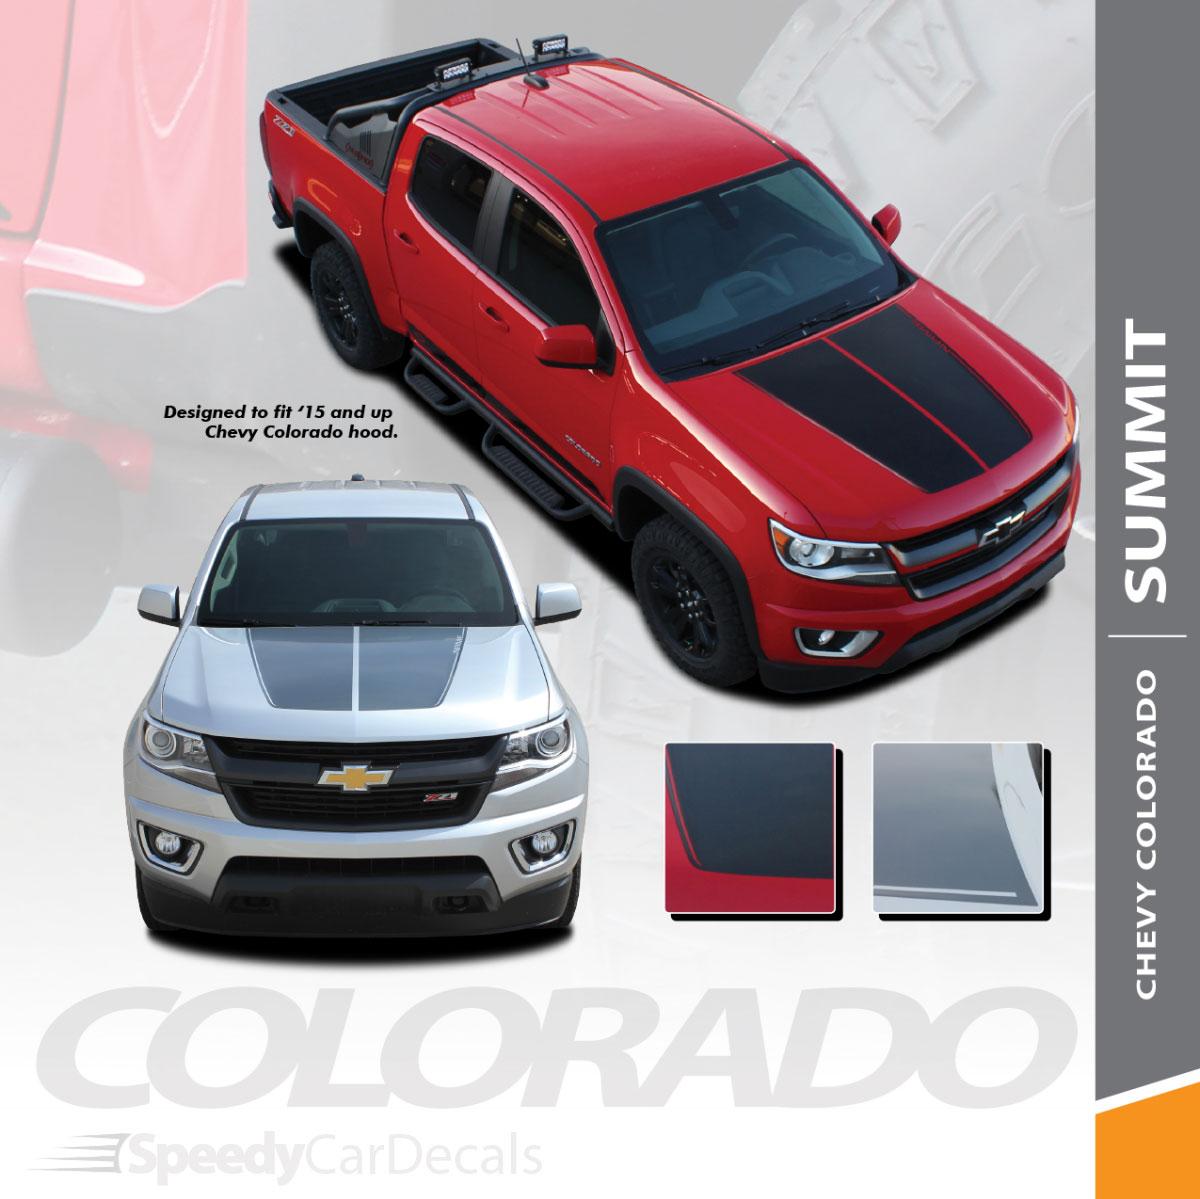 Decal Vinyl Color Sticker Hood Fit Any Car Anime 63 In 2020 Car Custom Car Decals Car Wrap